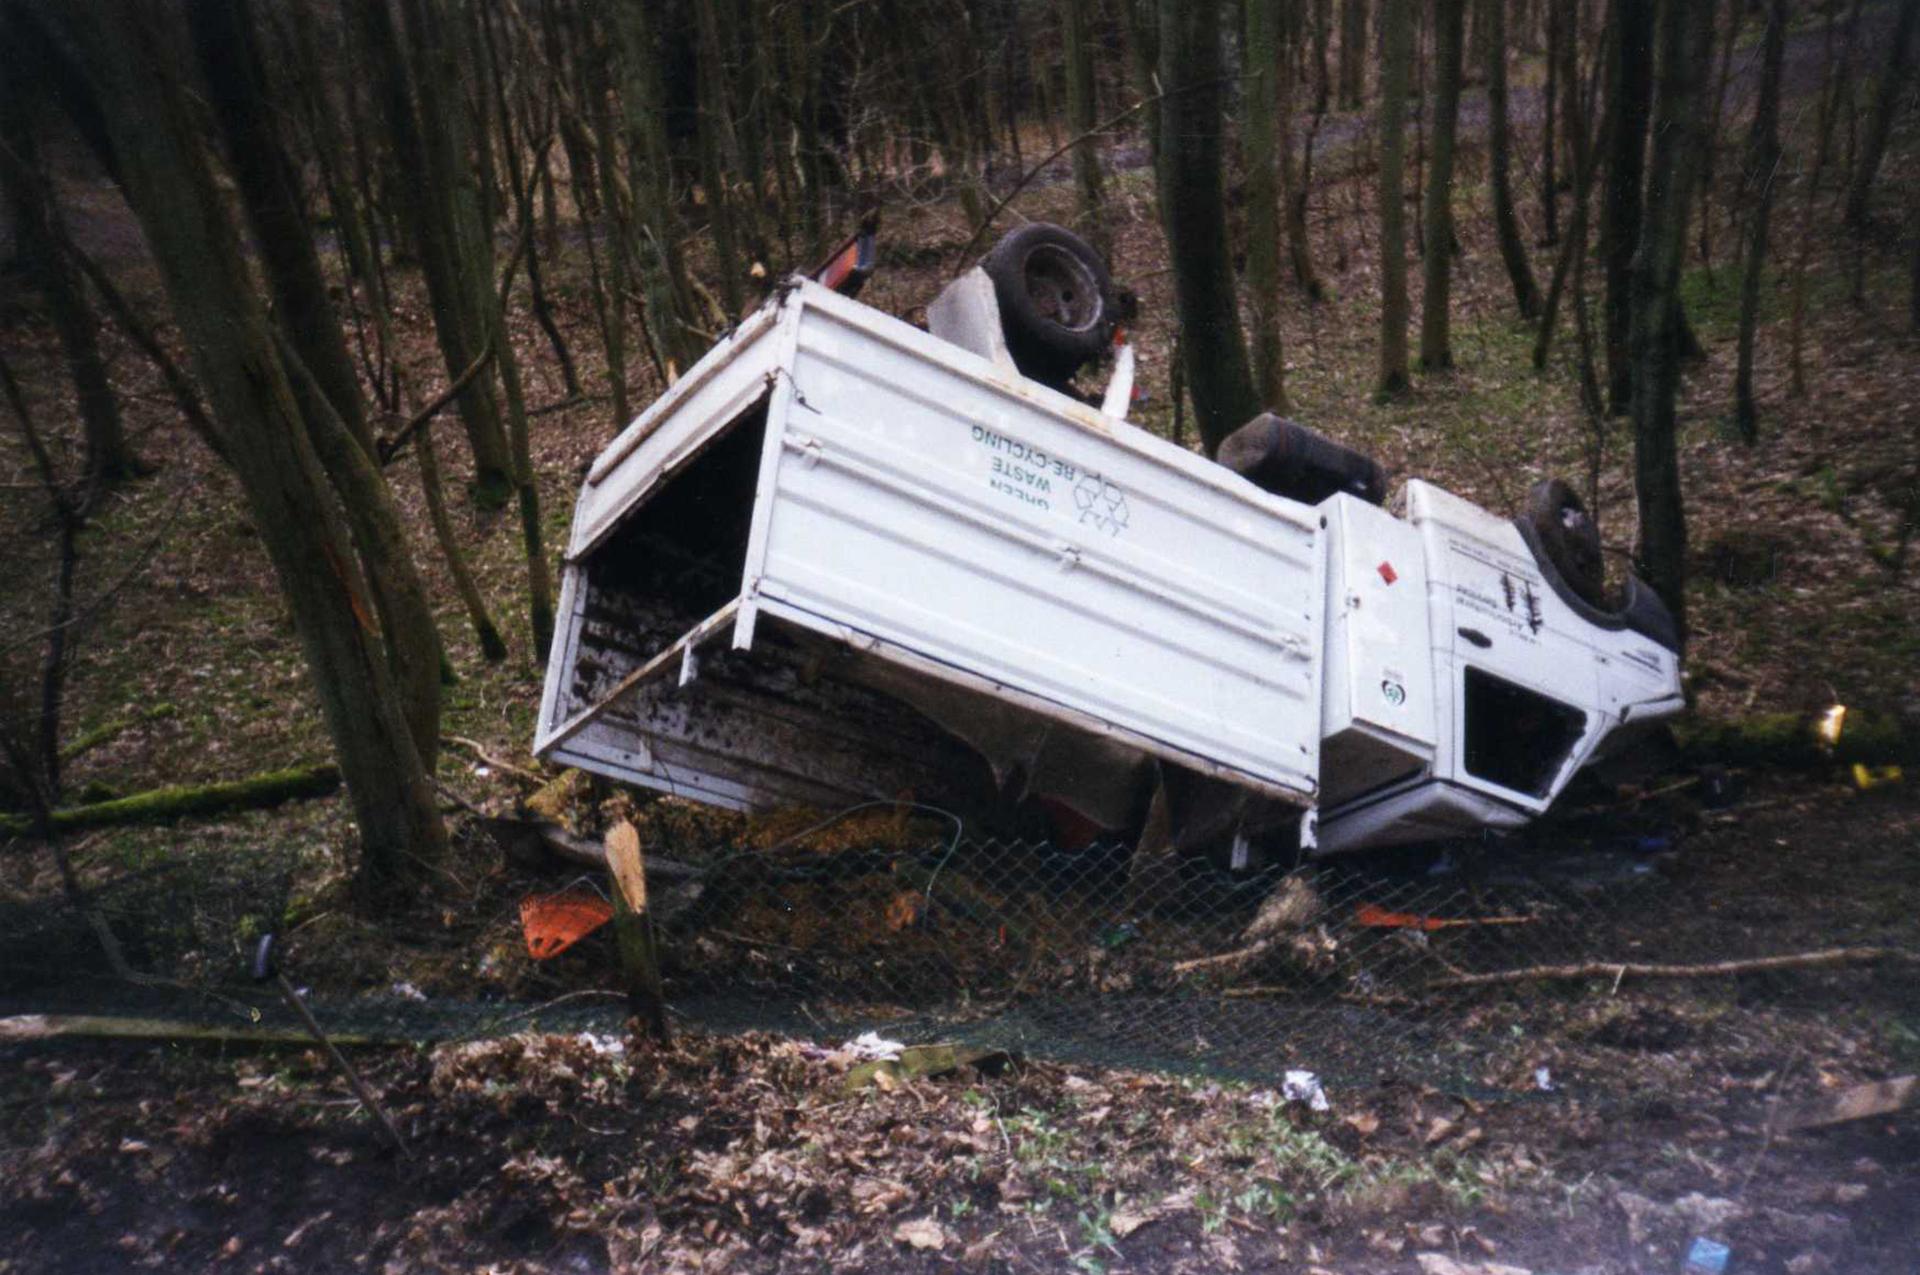 Truck crashed down embankment